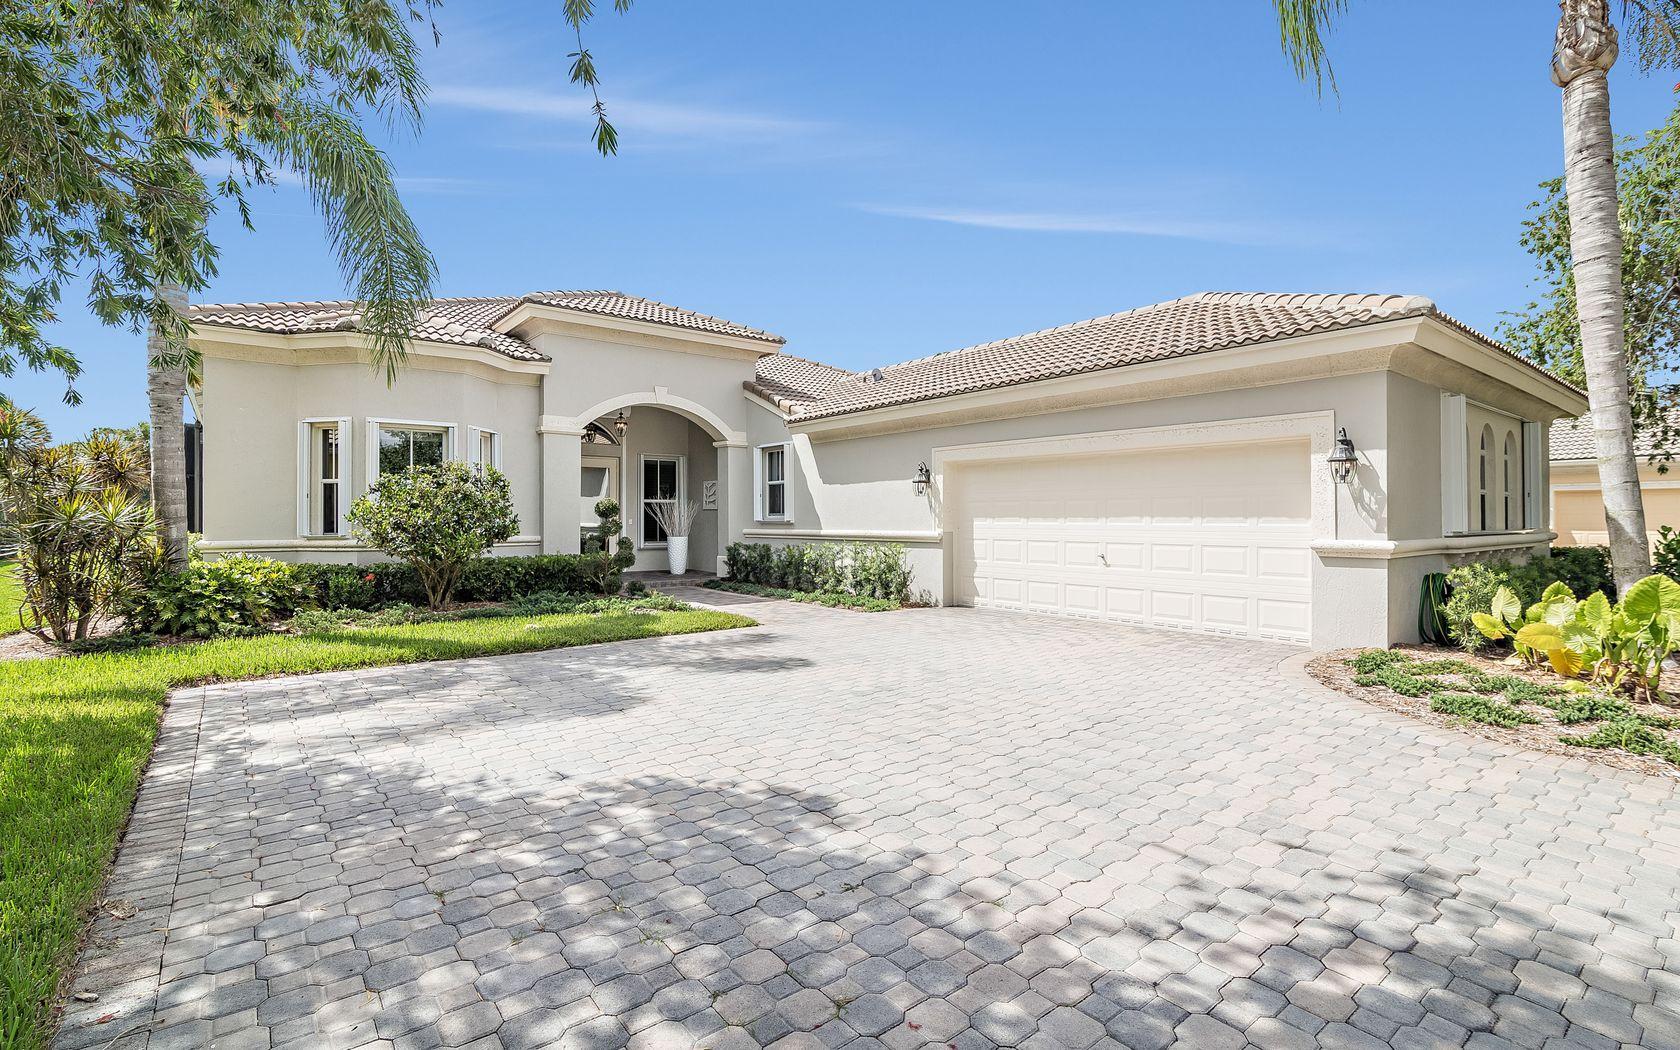 7870 Preserve Drive, West Palm Beach, Florida 33412, 3 Bedrooms Bedrooms, ,2.1 BathroomsBathrooms,F,Single family,Preserve,RX-10531741